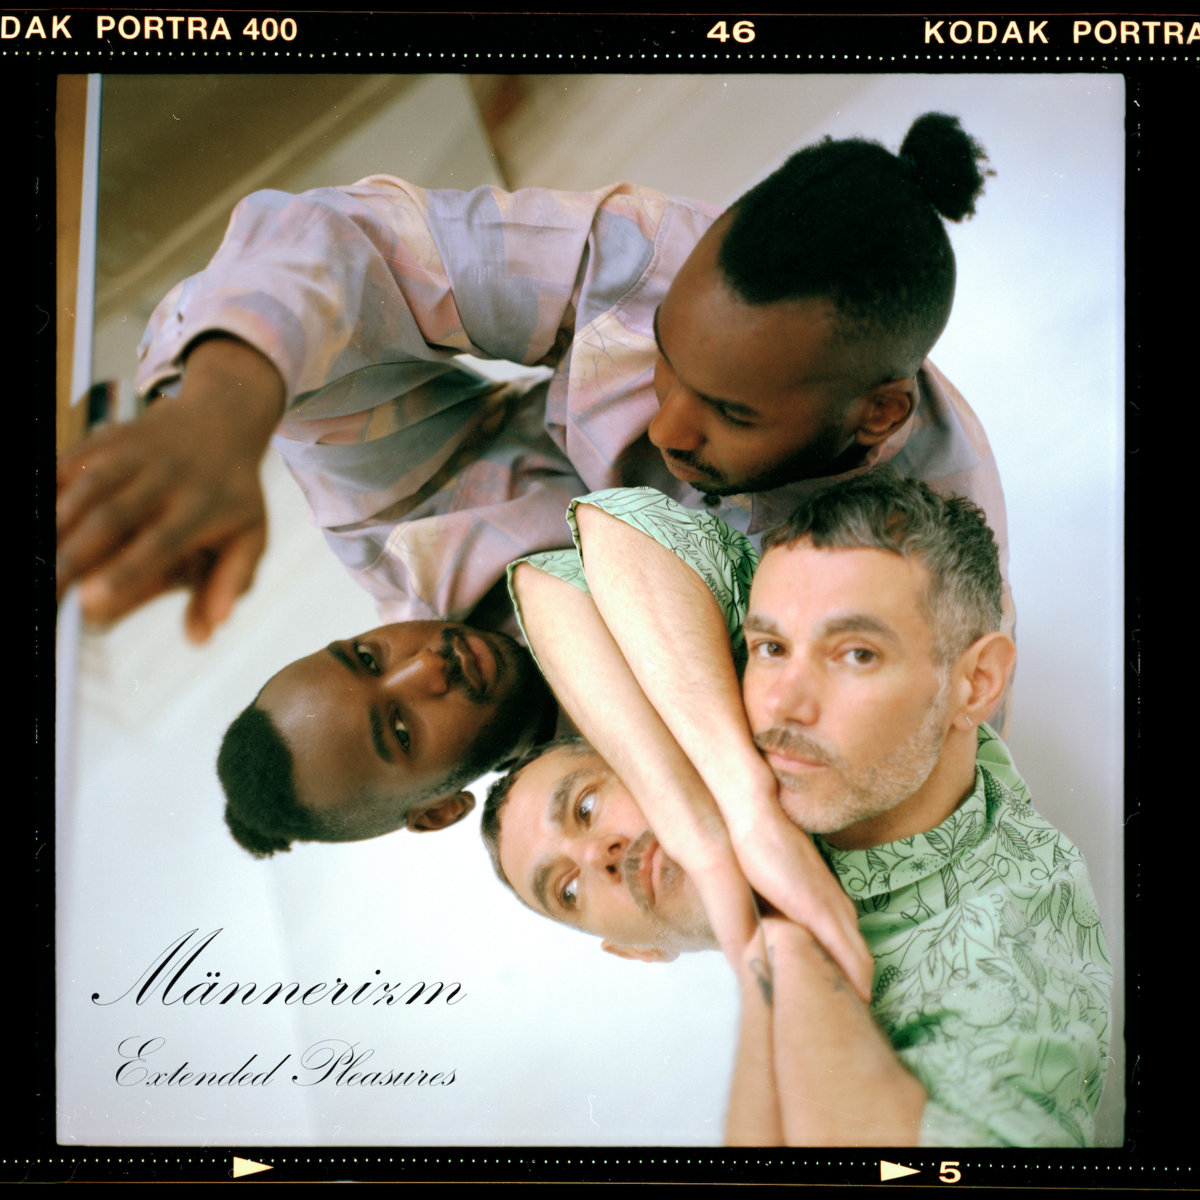 Männerizm Album Cover